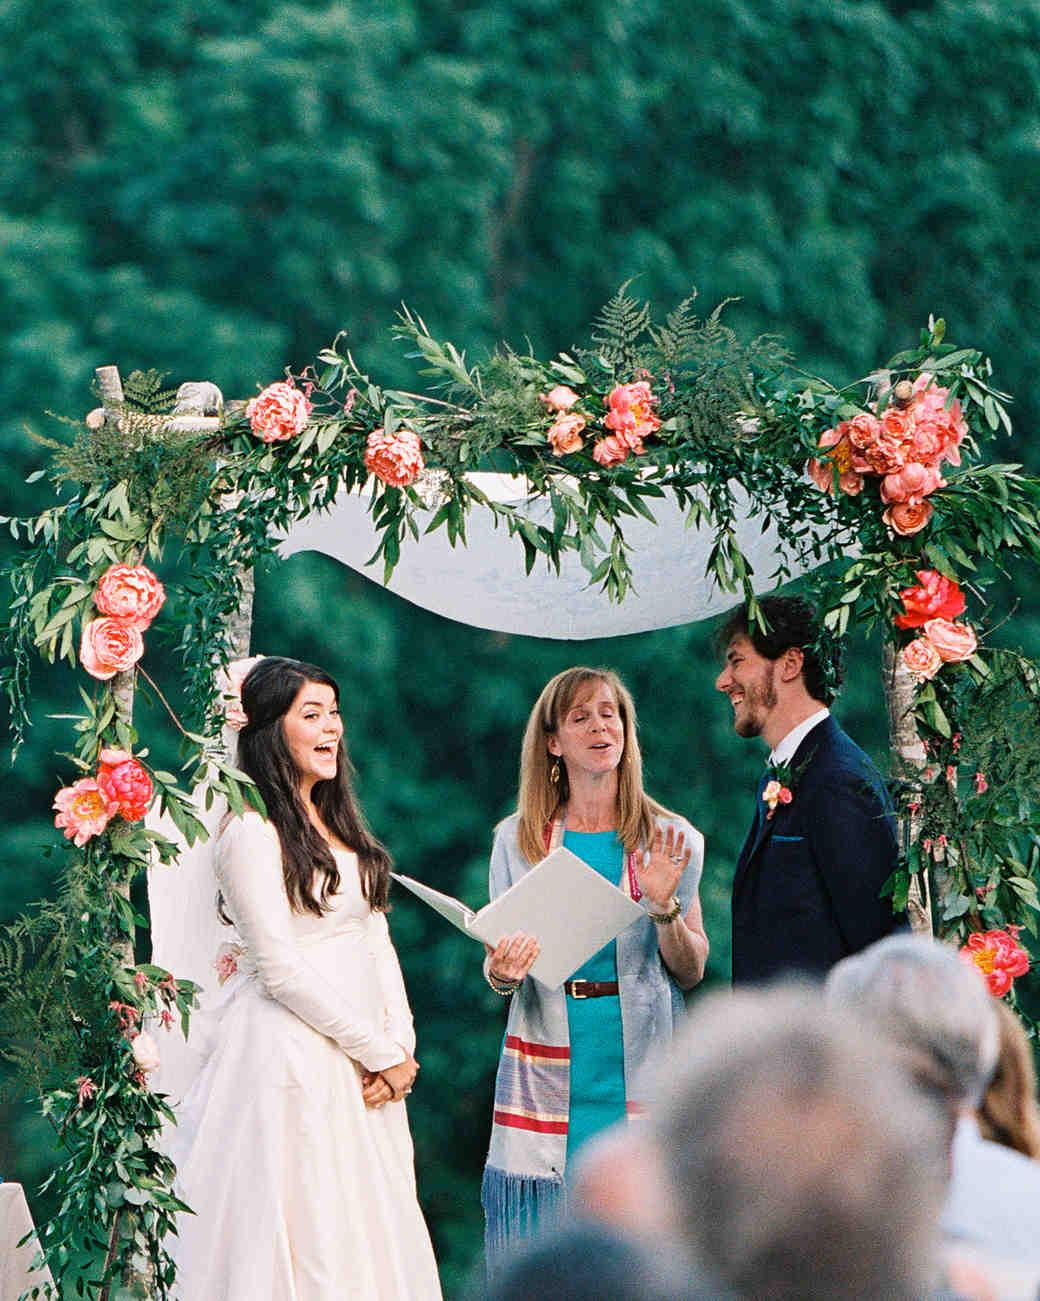 carrie-dan-ceremony-bride-groom-053114-c-060-s111627.jpg